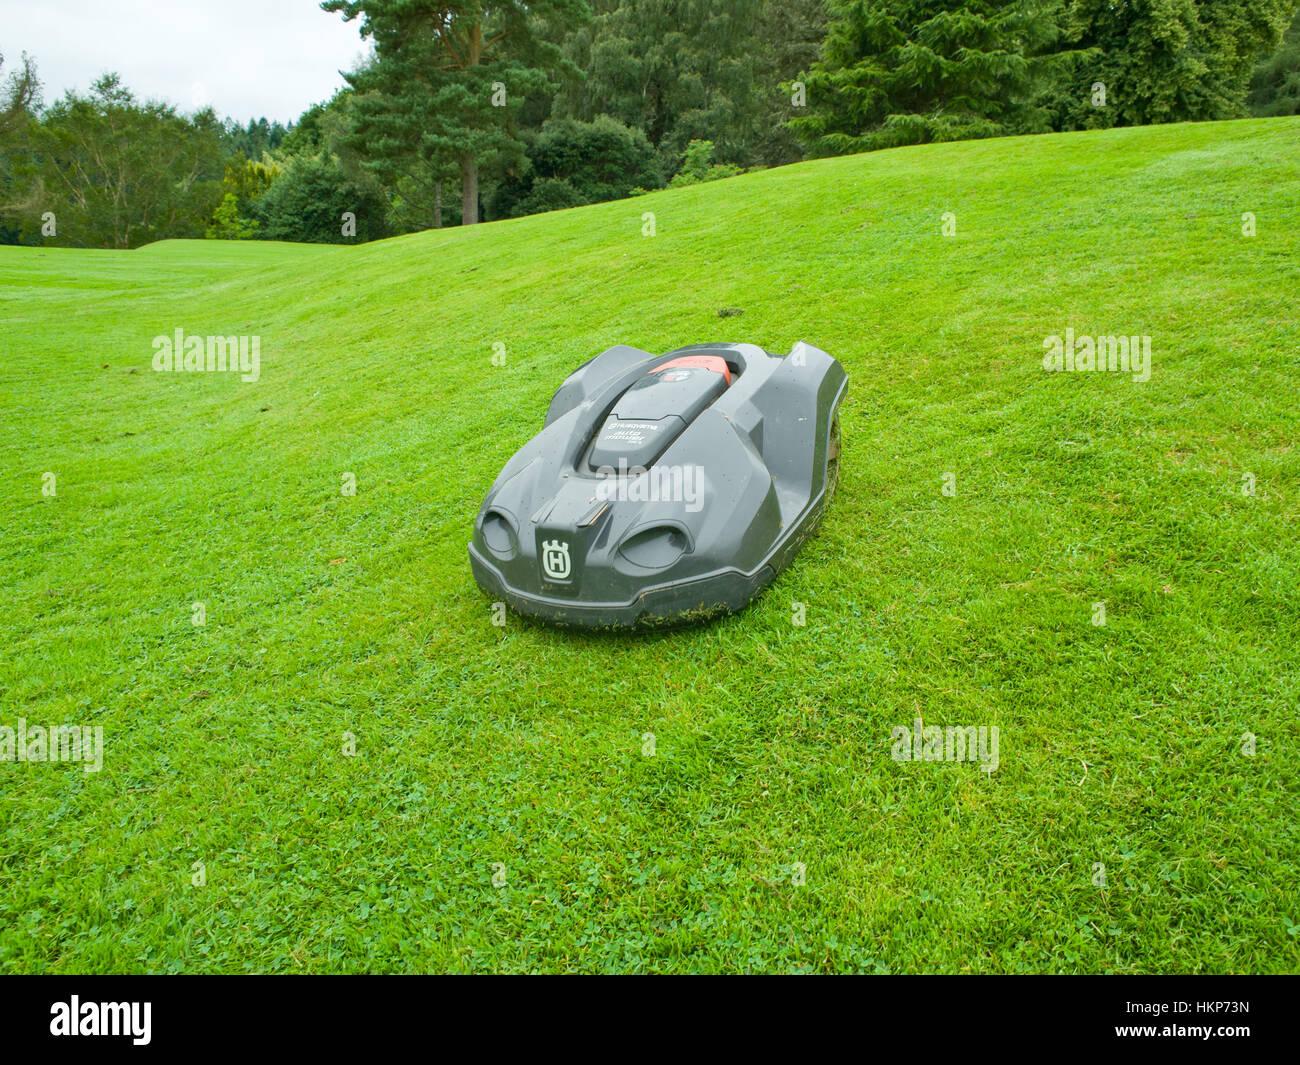 Husqvarna automower cutting lawn Stock Photo